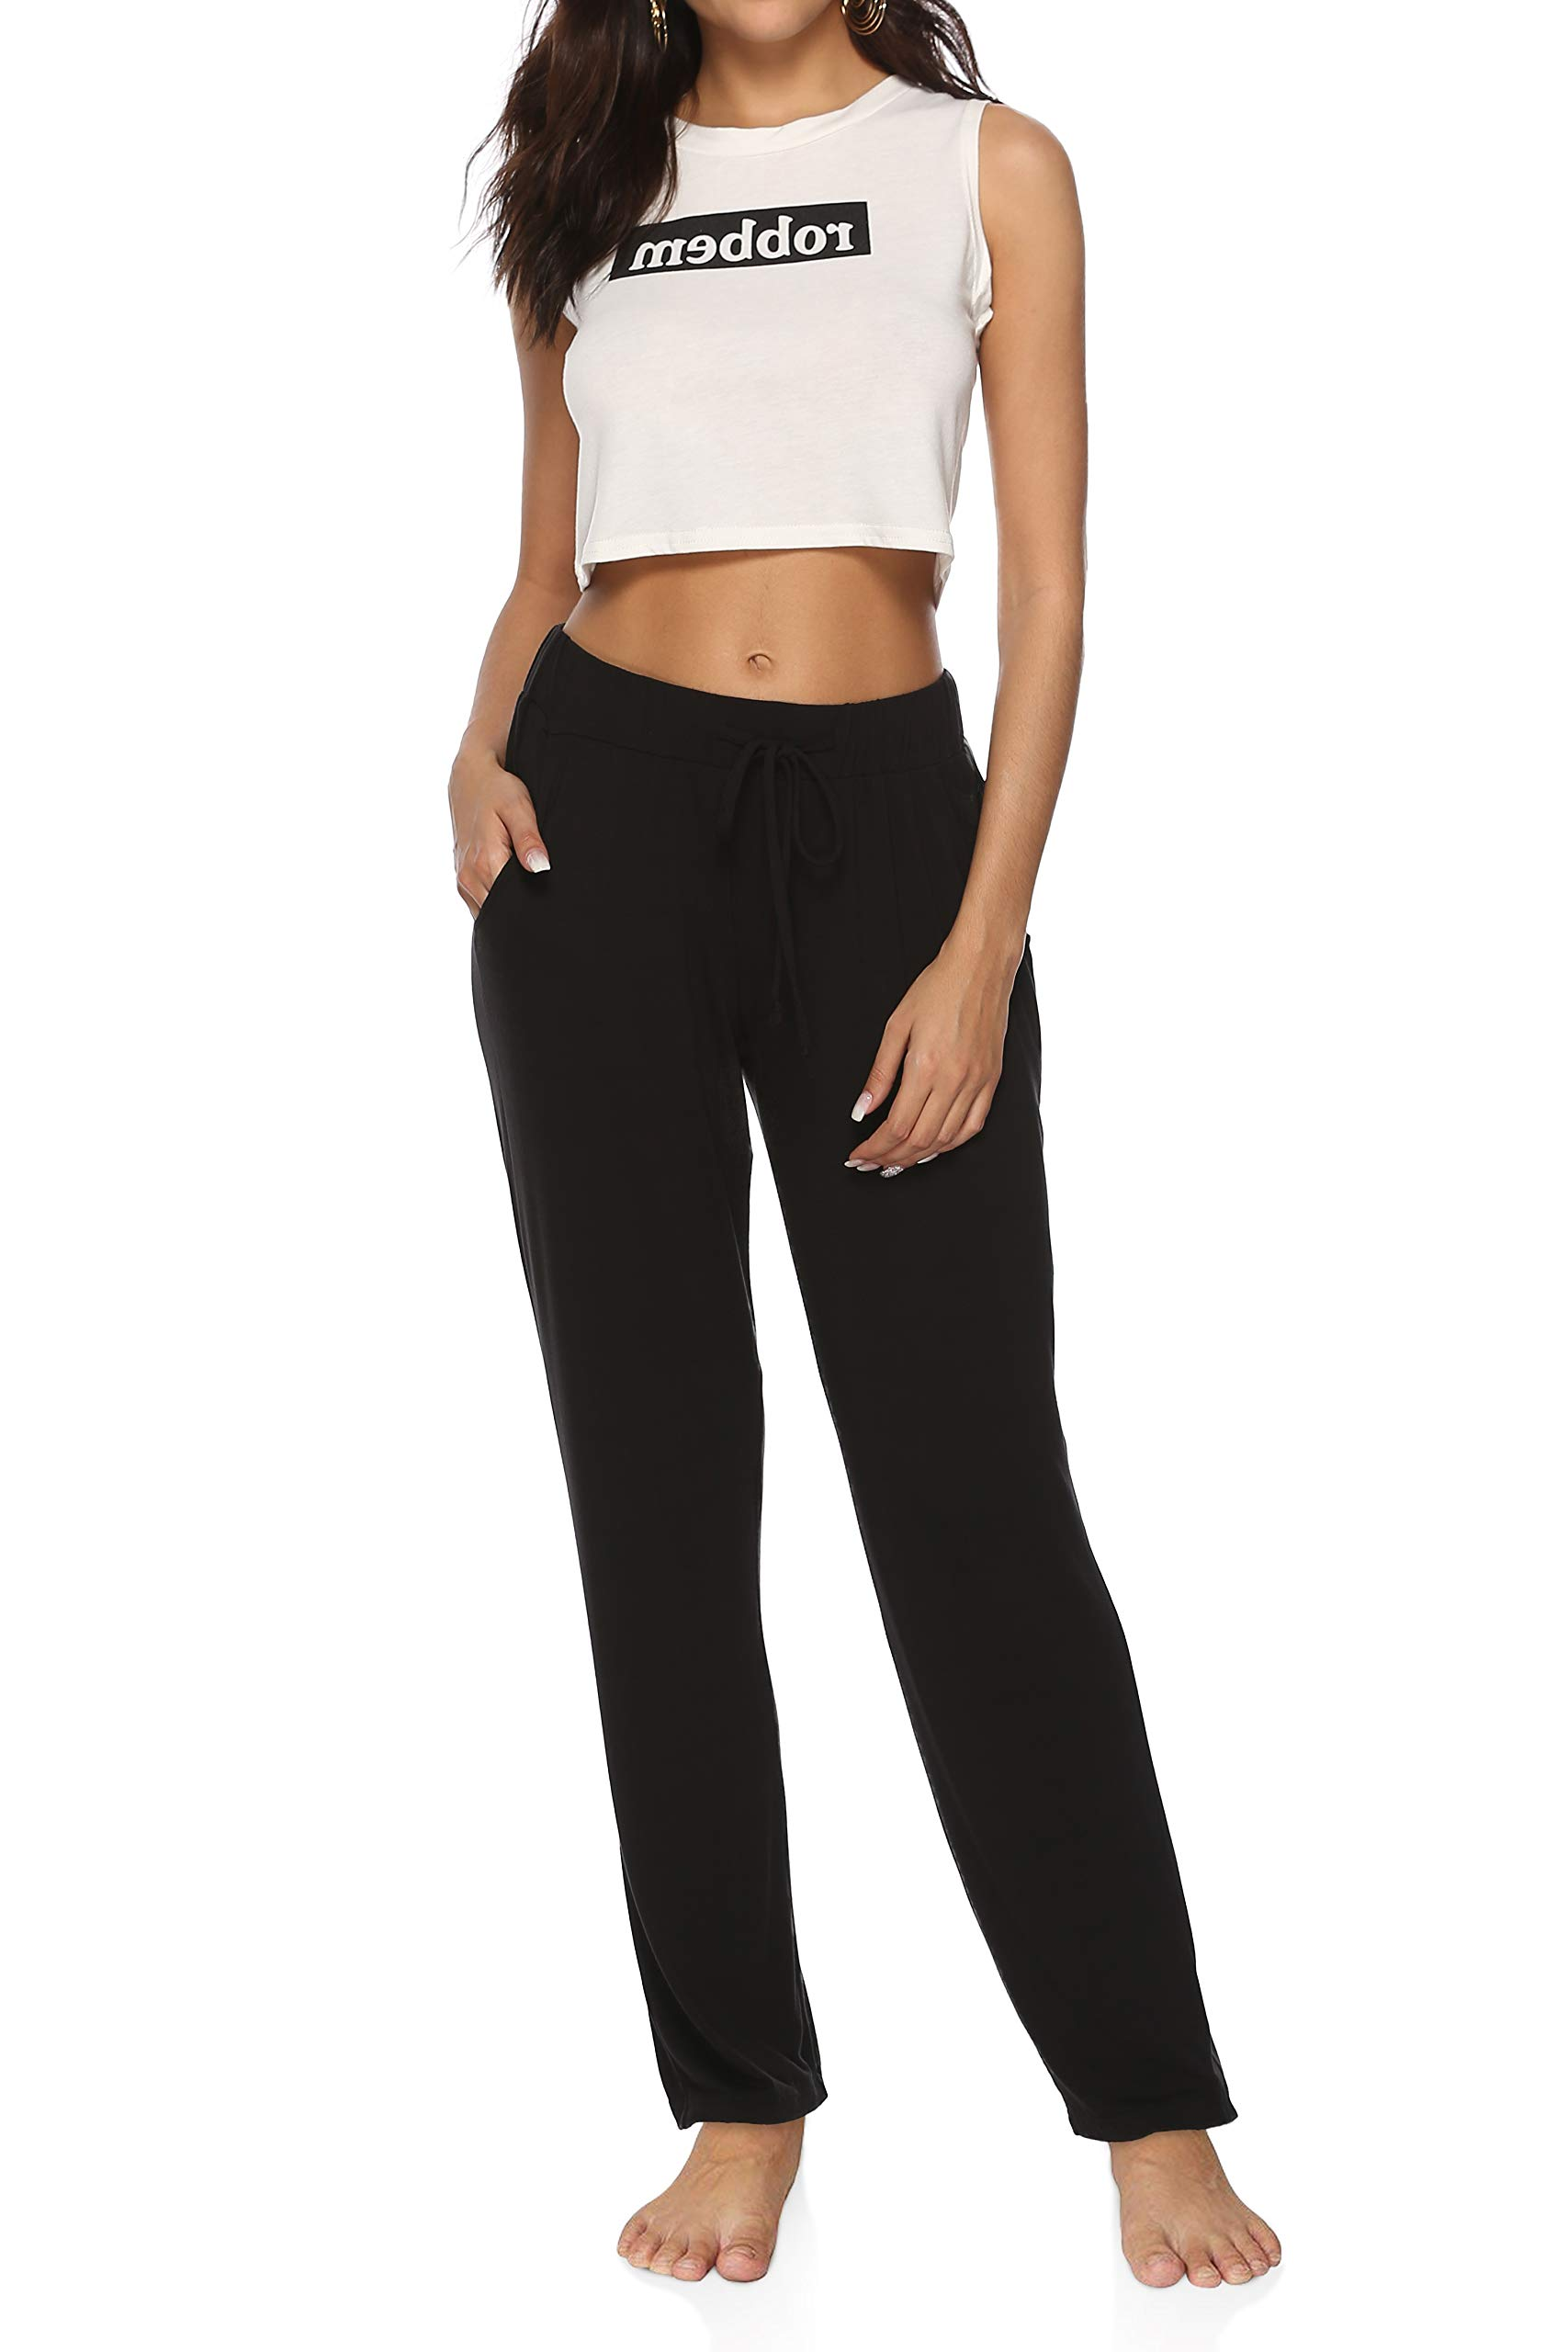 Power Flex Gym Leggings Women Solid Yoga Pant High Waist